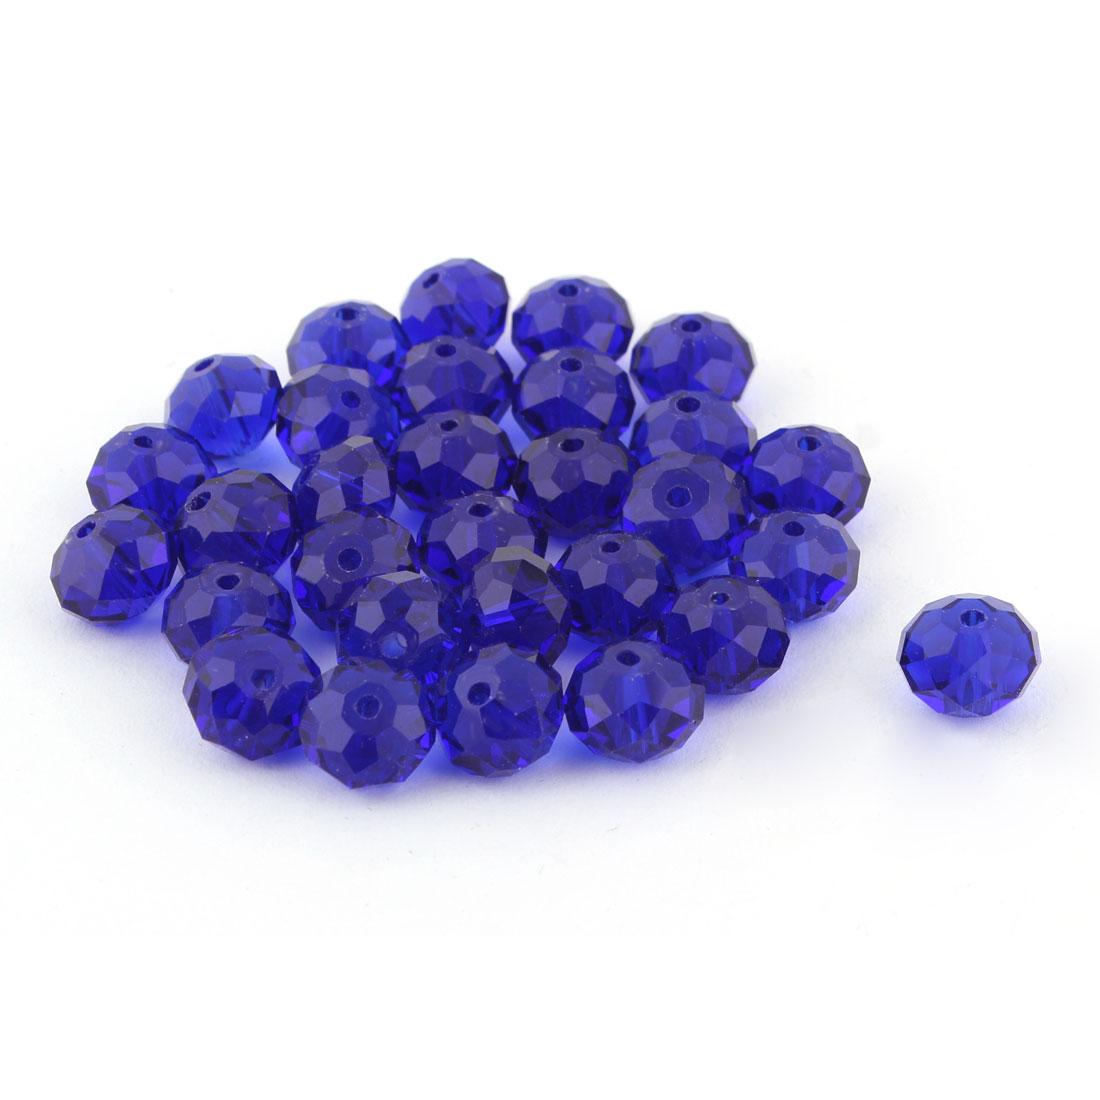 Women Jewelry Bracelet Necklace Artifical Glittery Crystal Beads Navy Blue 10MM 30 PCS